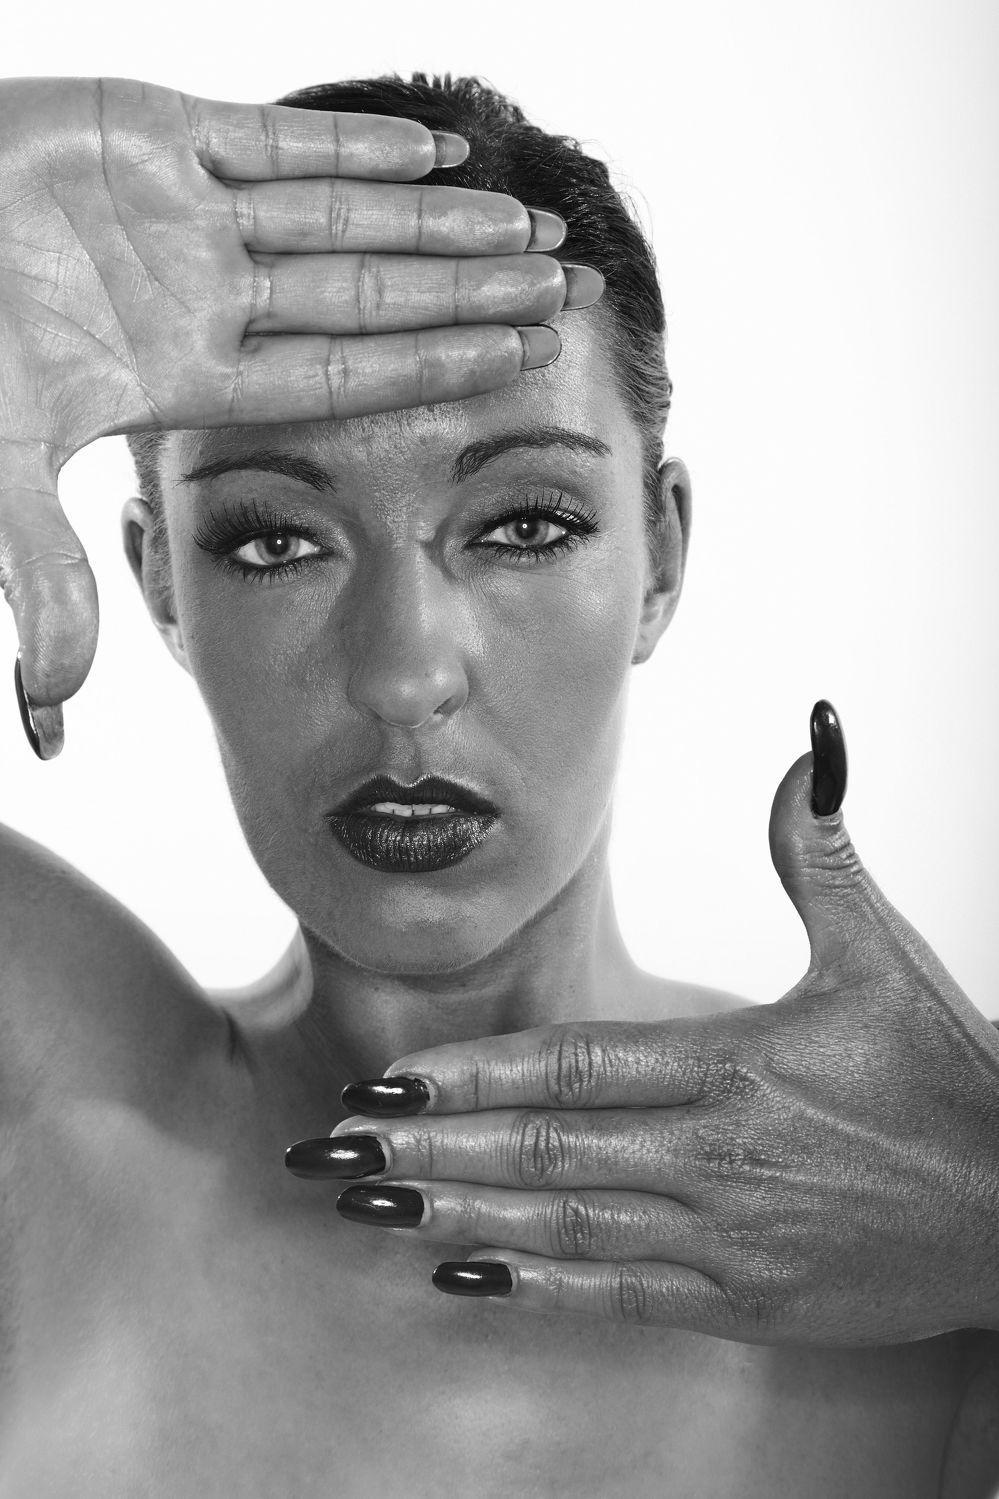 Bild mit Akt, Aktmodel, Fotomodel, Aktbild, Aktaufnahme, Aktfoto, Aktfotografie